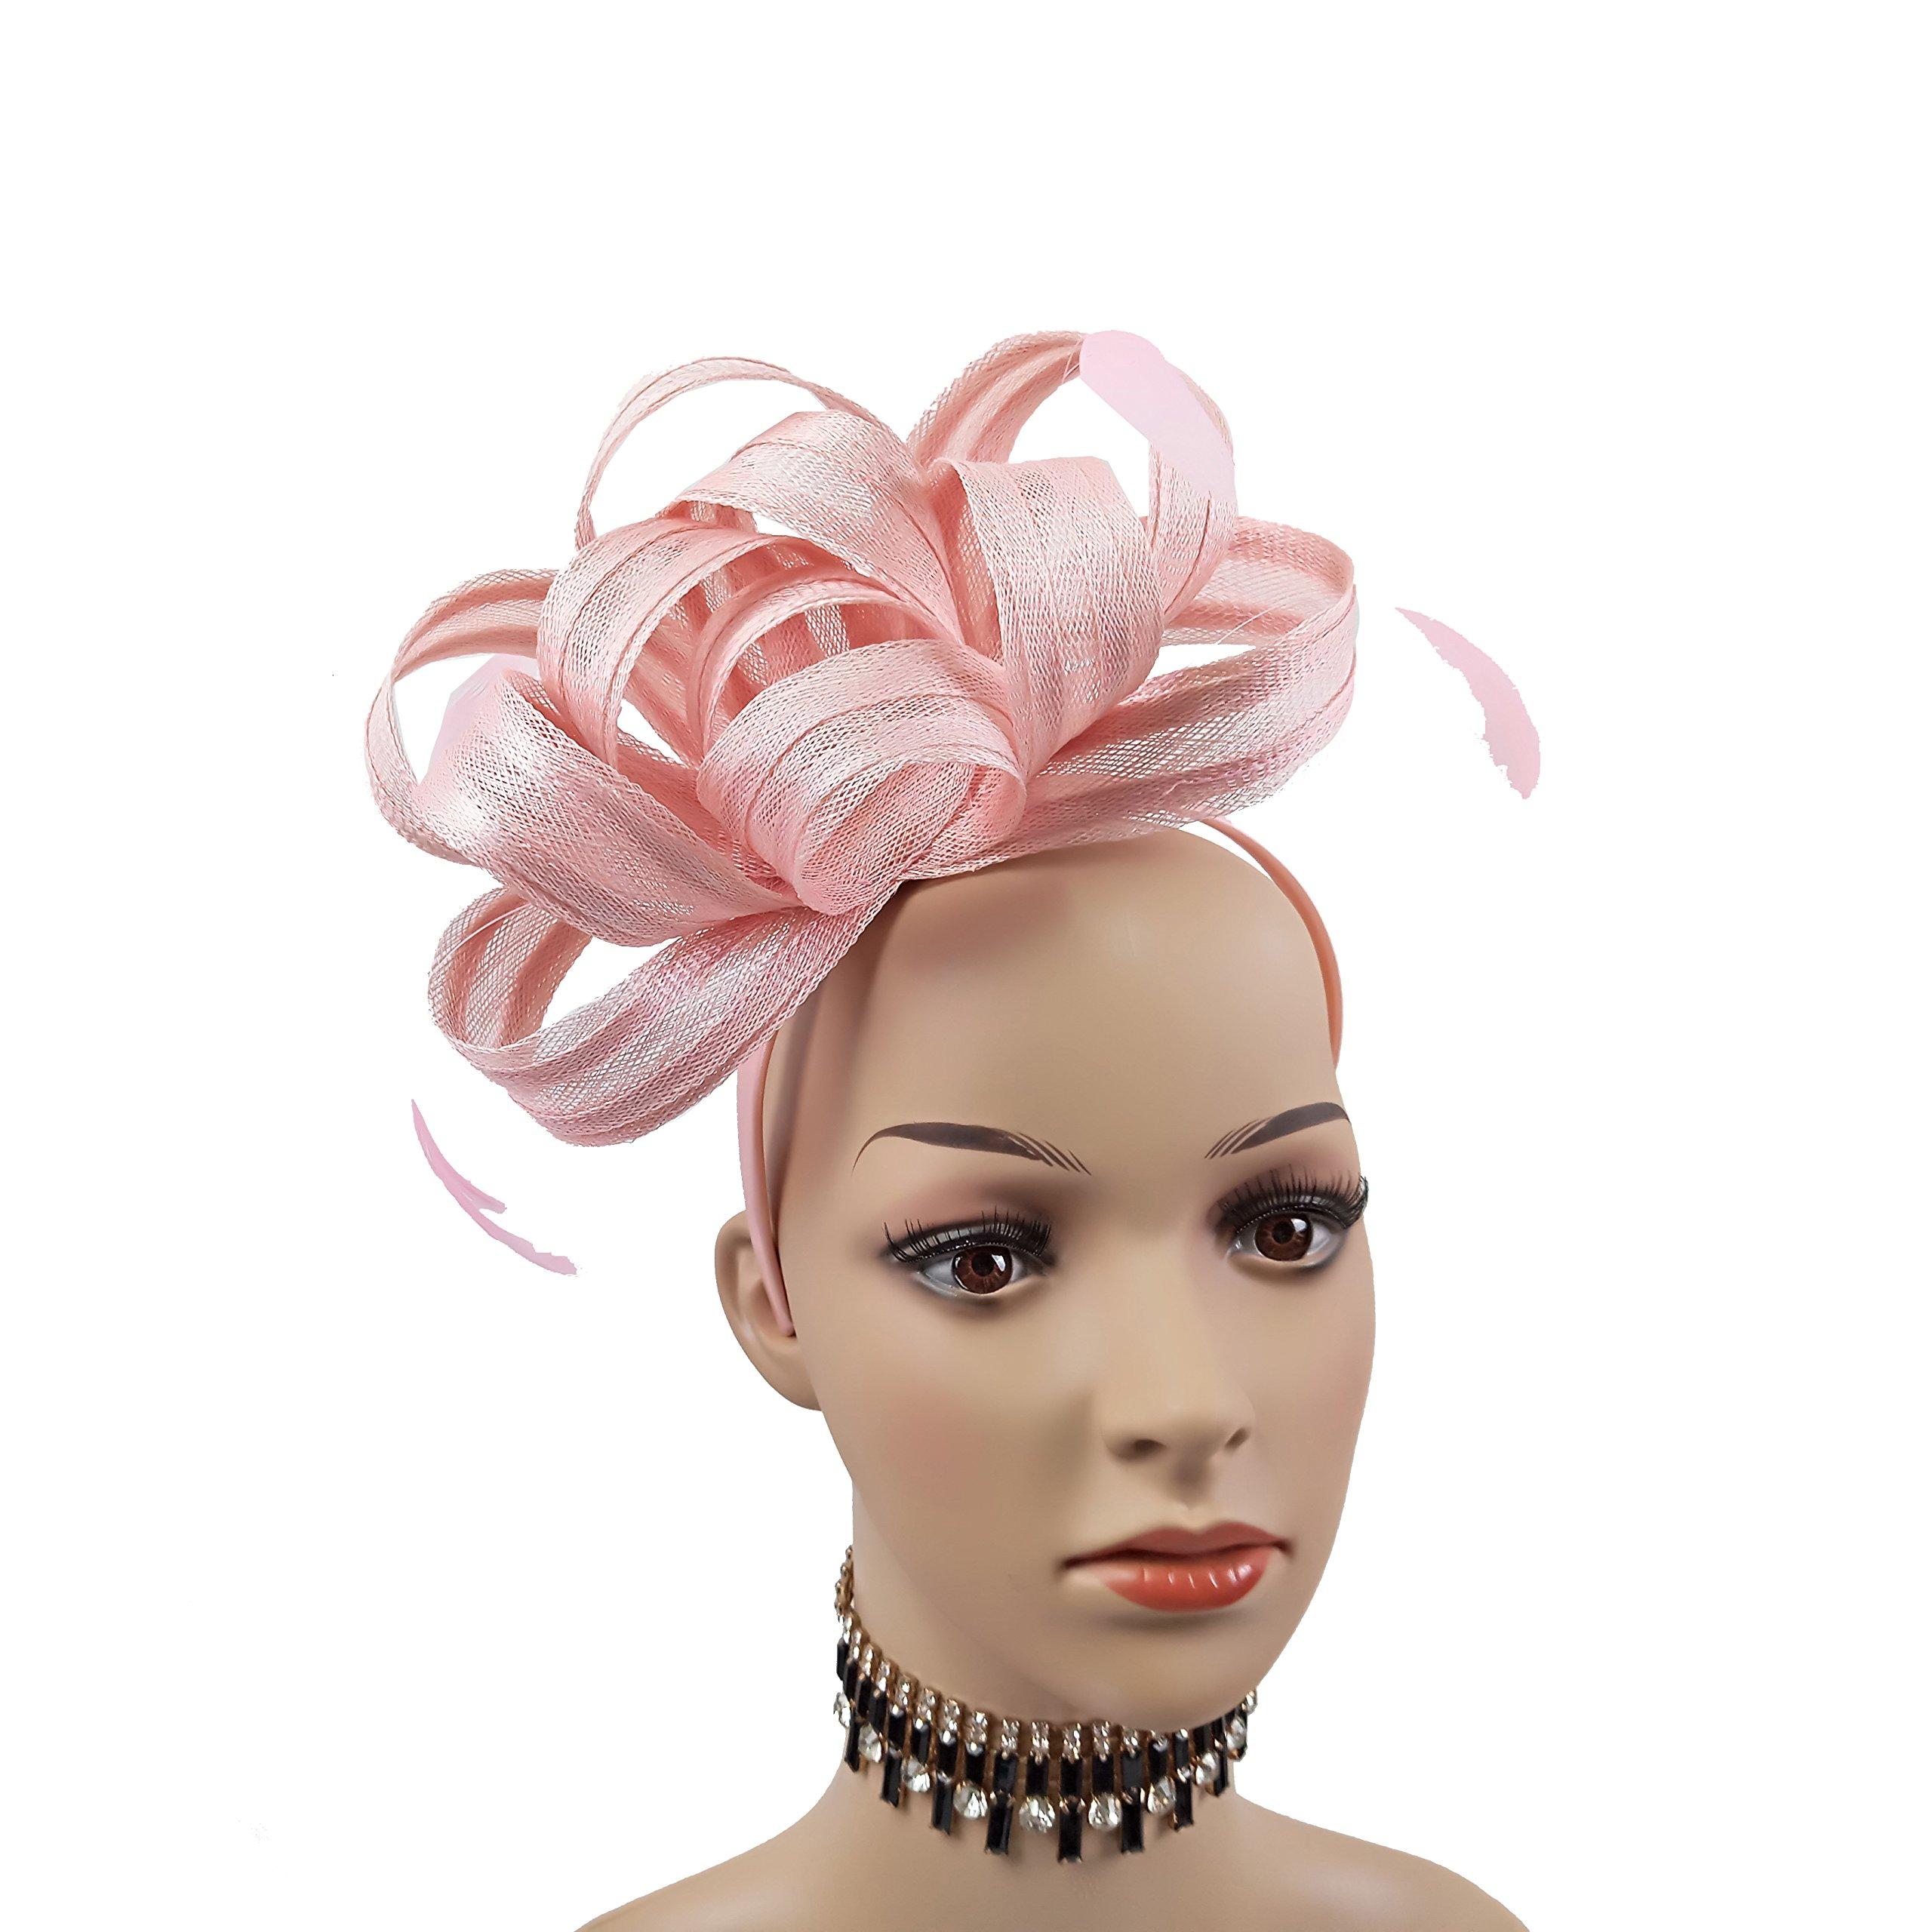 Women Sinamay Fascinator Headband Clip Head Piece Hat for Tea Party Racing Debery Church Wedding Special Occasions